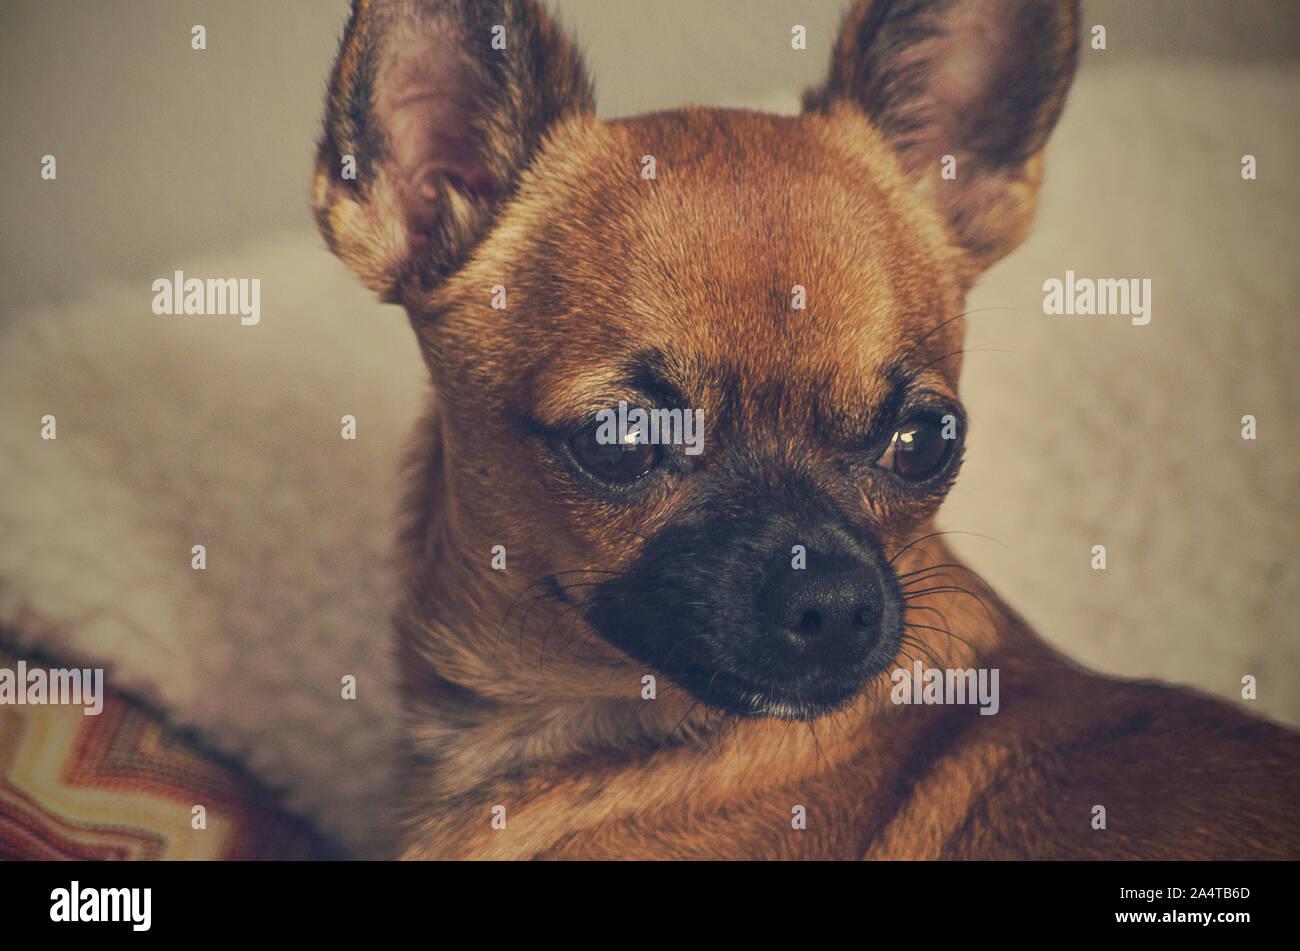 Lazy Chihuahua Stockfotos Und Bilder Kaufen Alamy